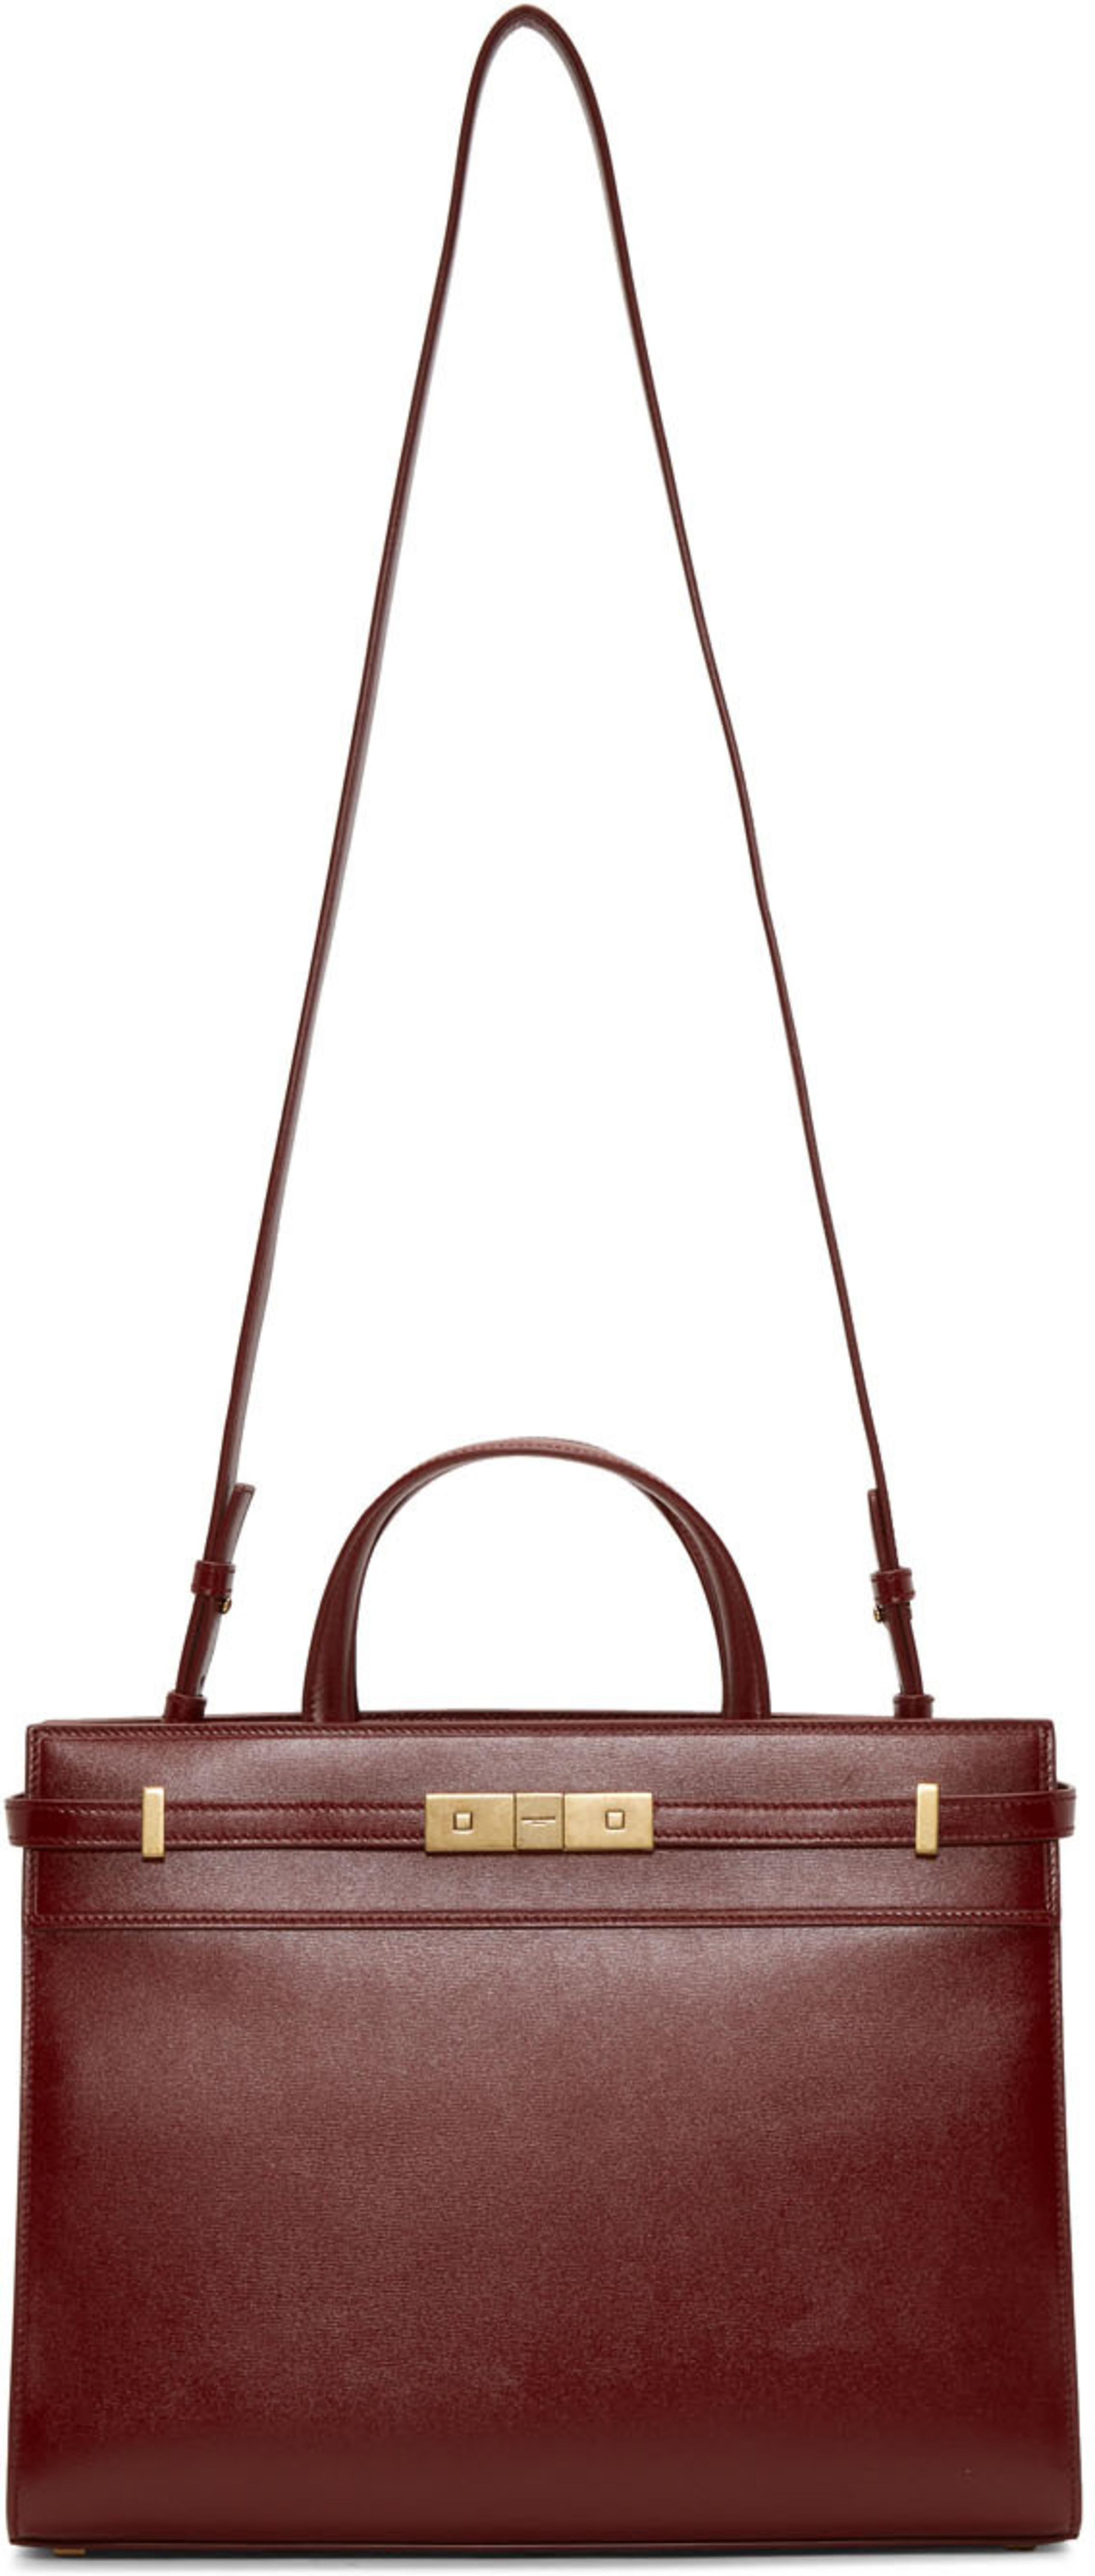 Saint Laurent bags for Women  1ec929994fb2c